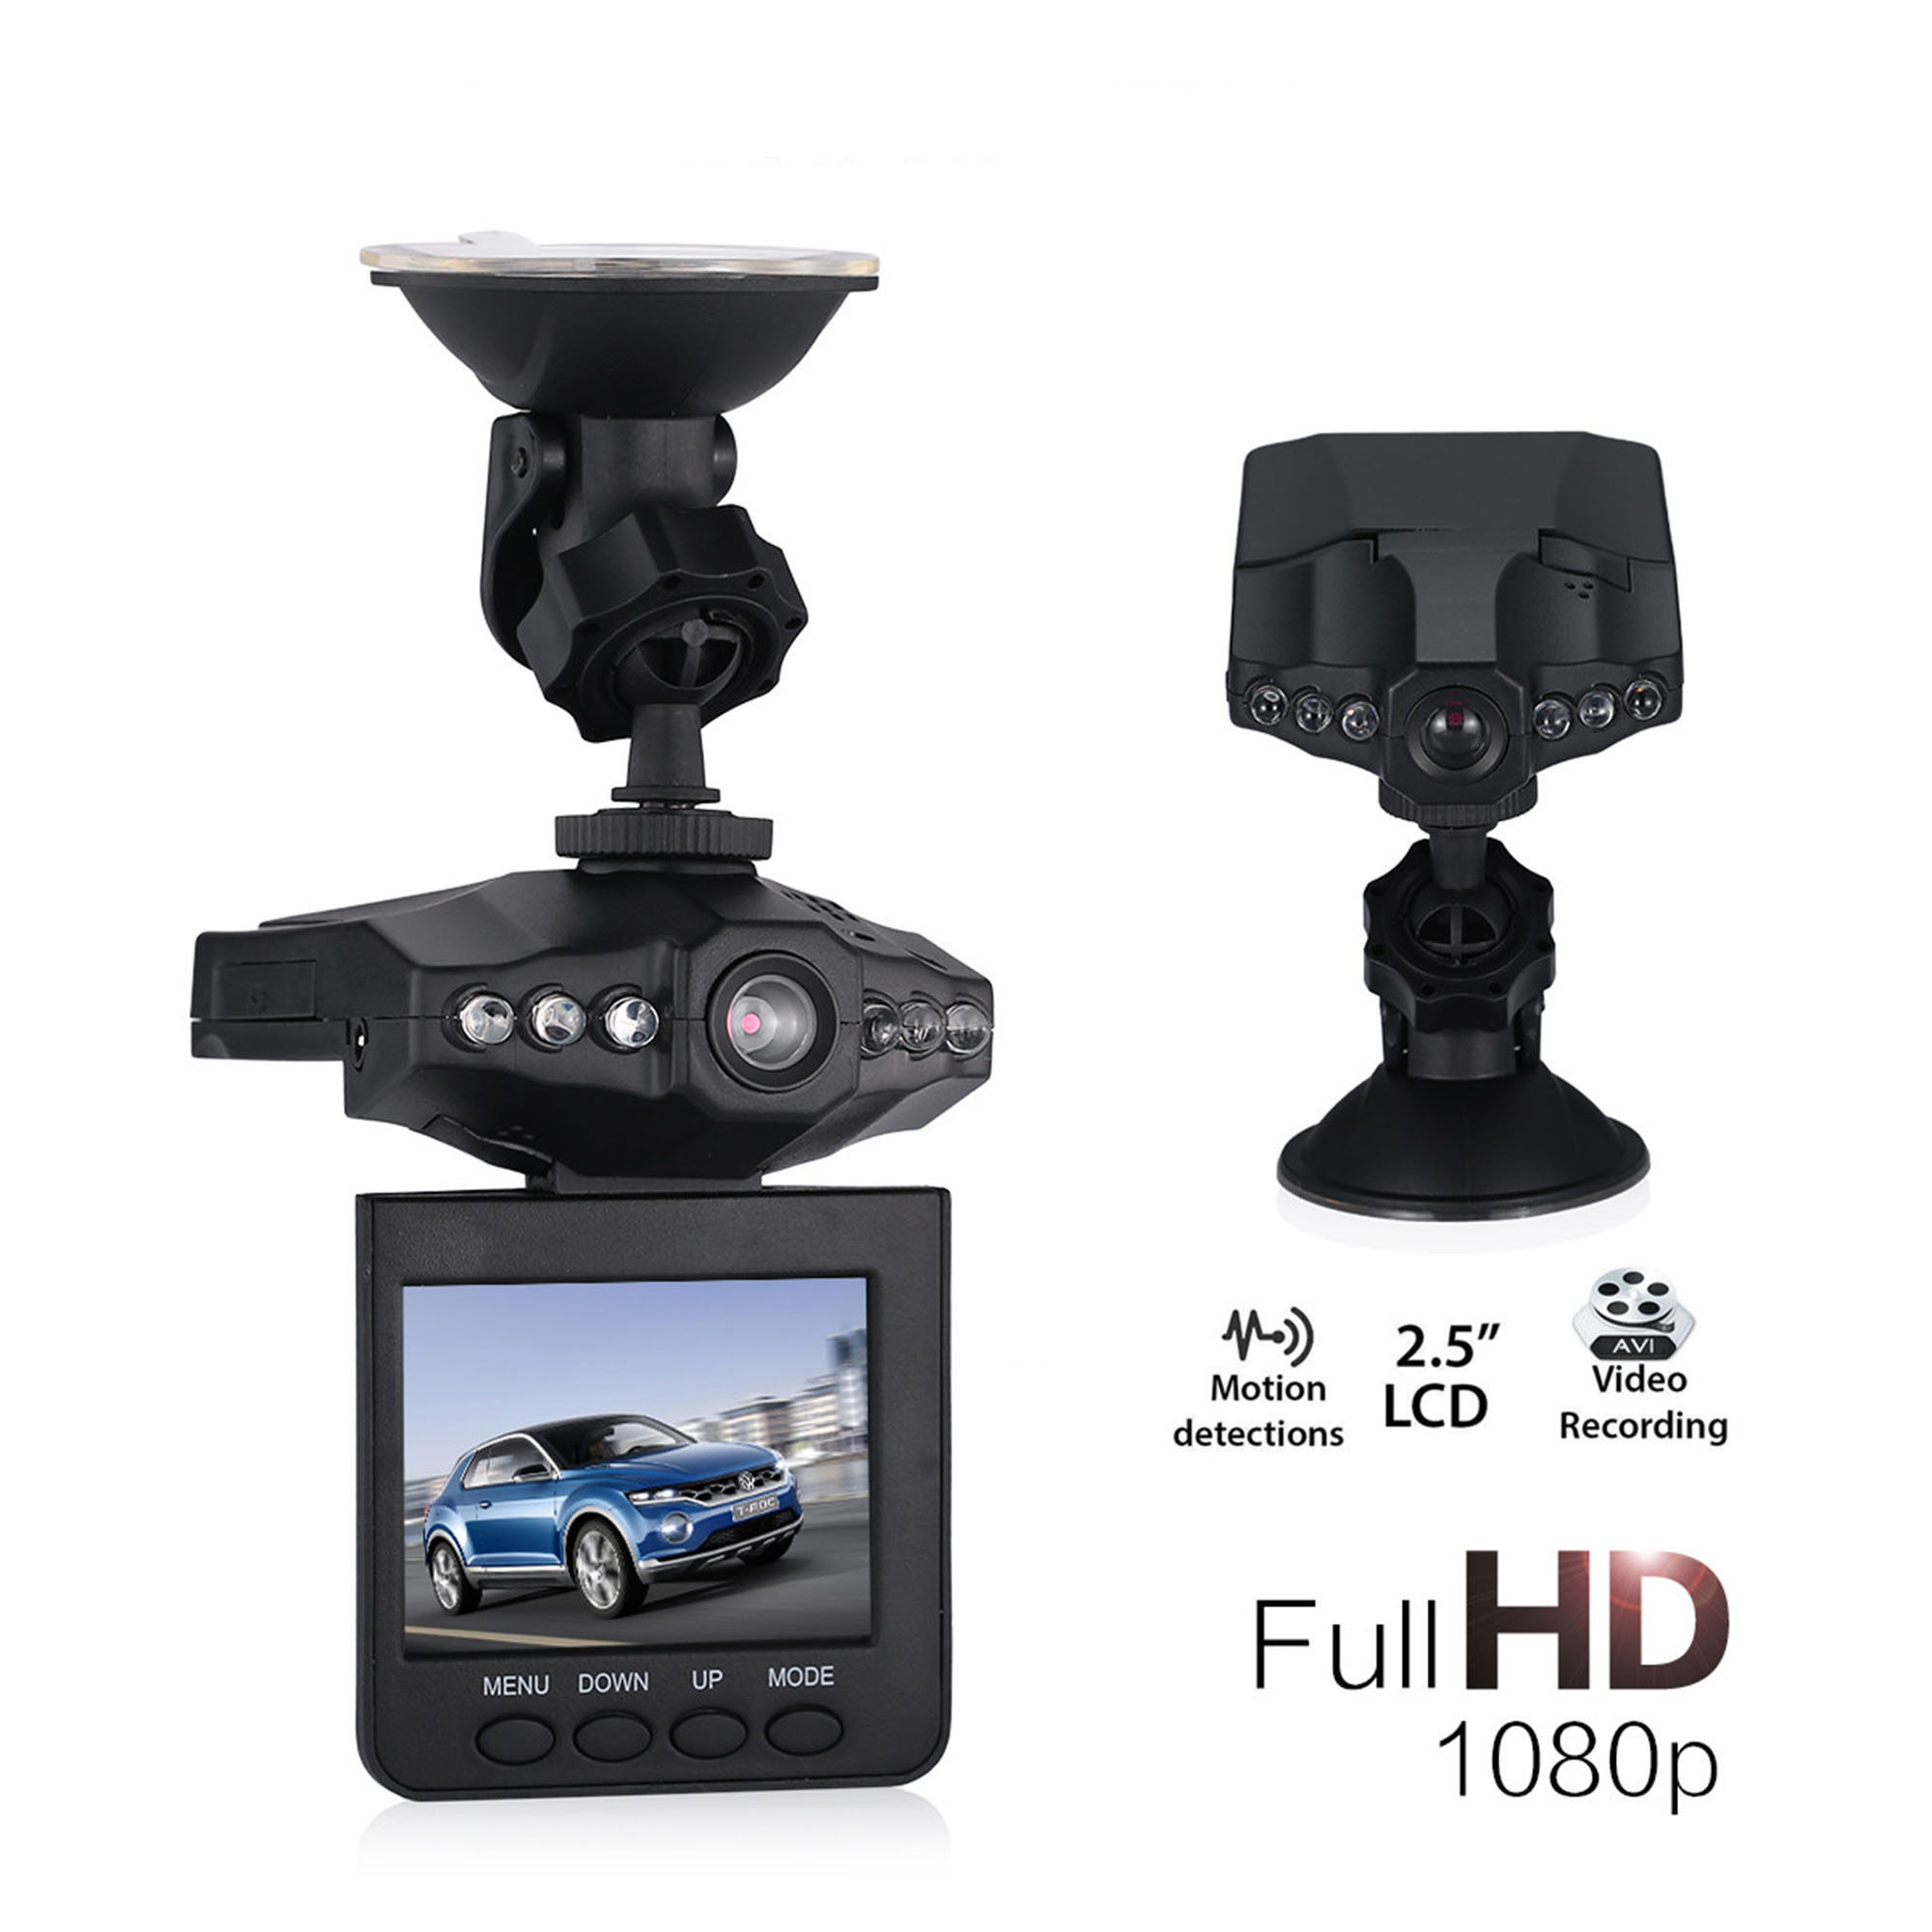 "2.5"" Full HD Dashcam with Night Vision 1080P 6 LED Car Video Recorder Dash Camera DVR G-sensor Car Recorder"